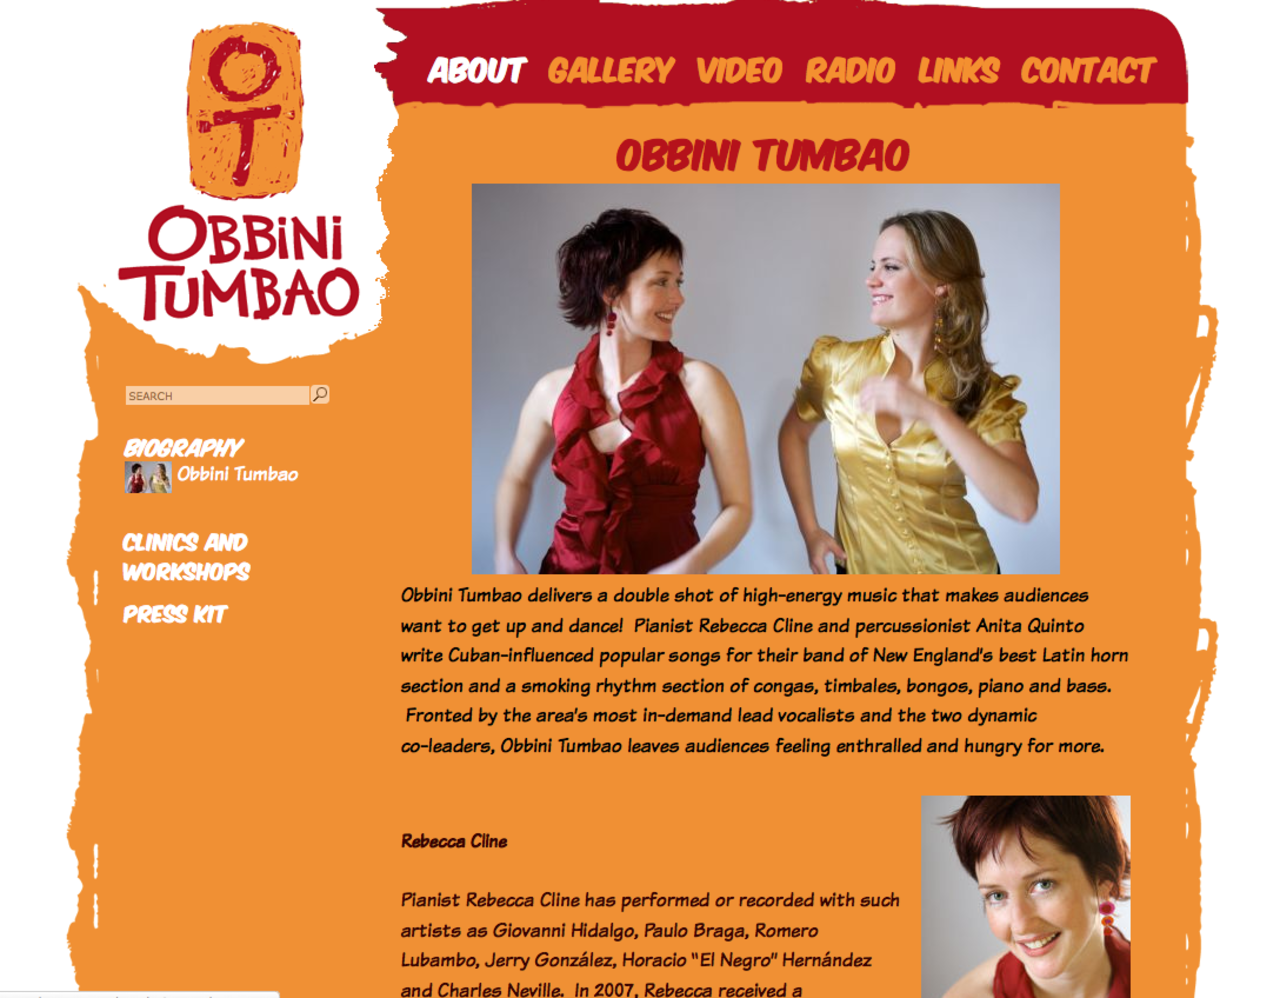 Obbini Tumbao